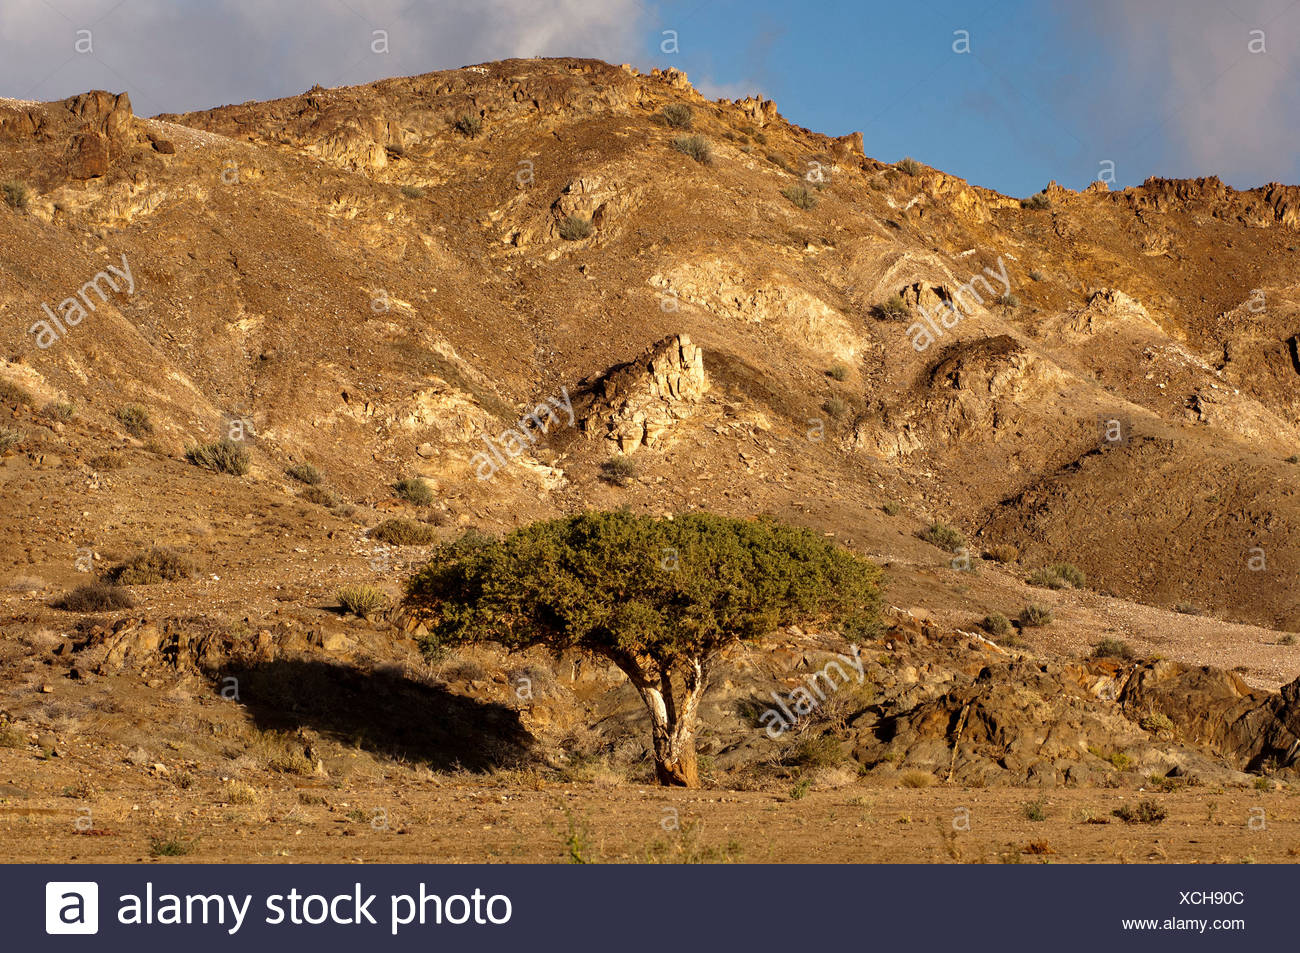 Witgatboom, Matoppie, Shepherd's Tree (Boscia albitrunca), Richtersveld National Park, Northern Cape, South Africa - Stock Image